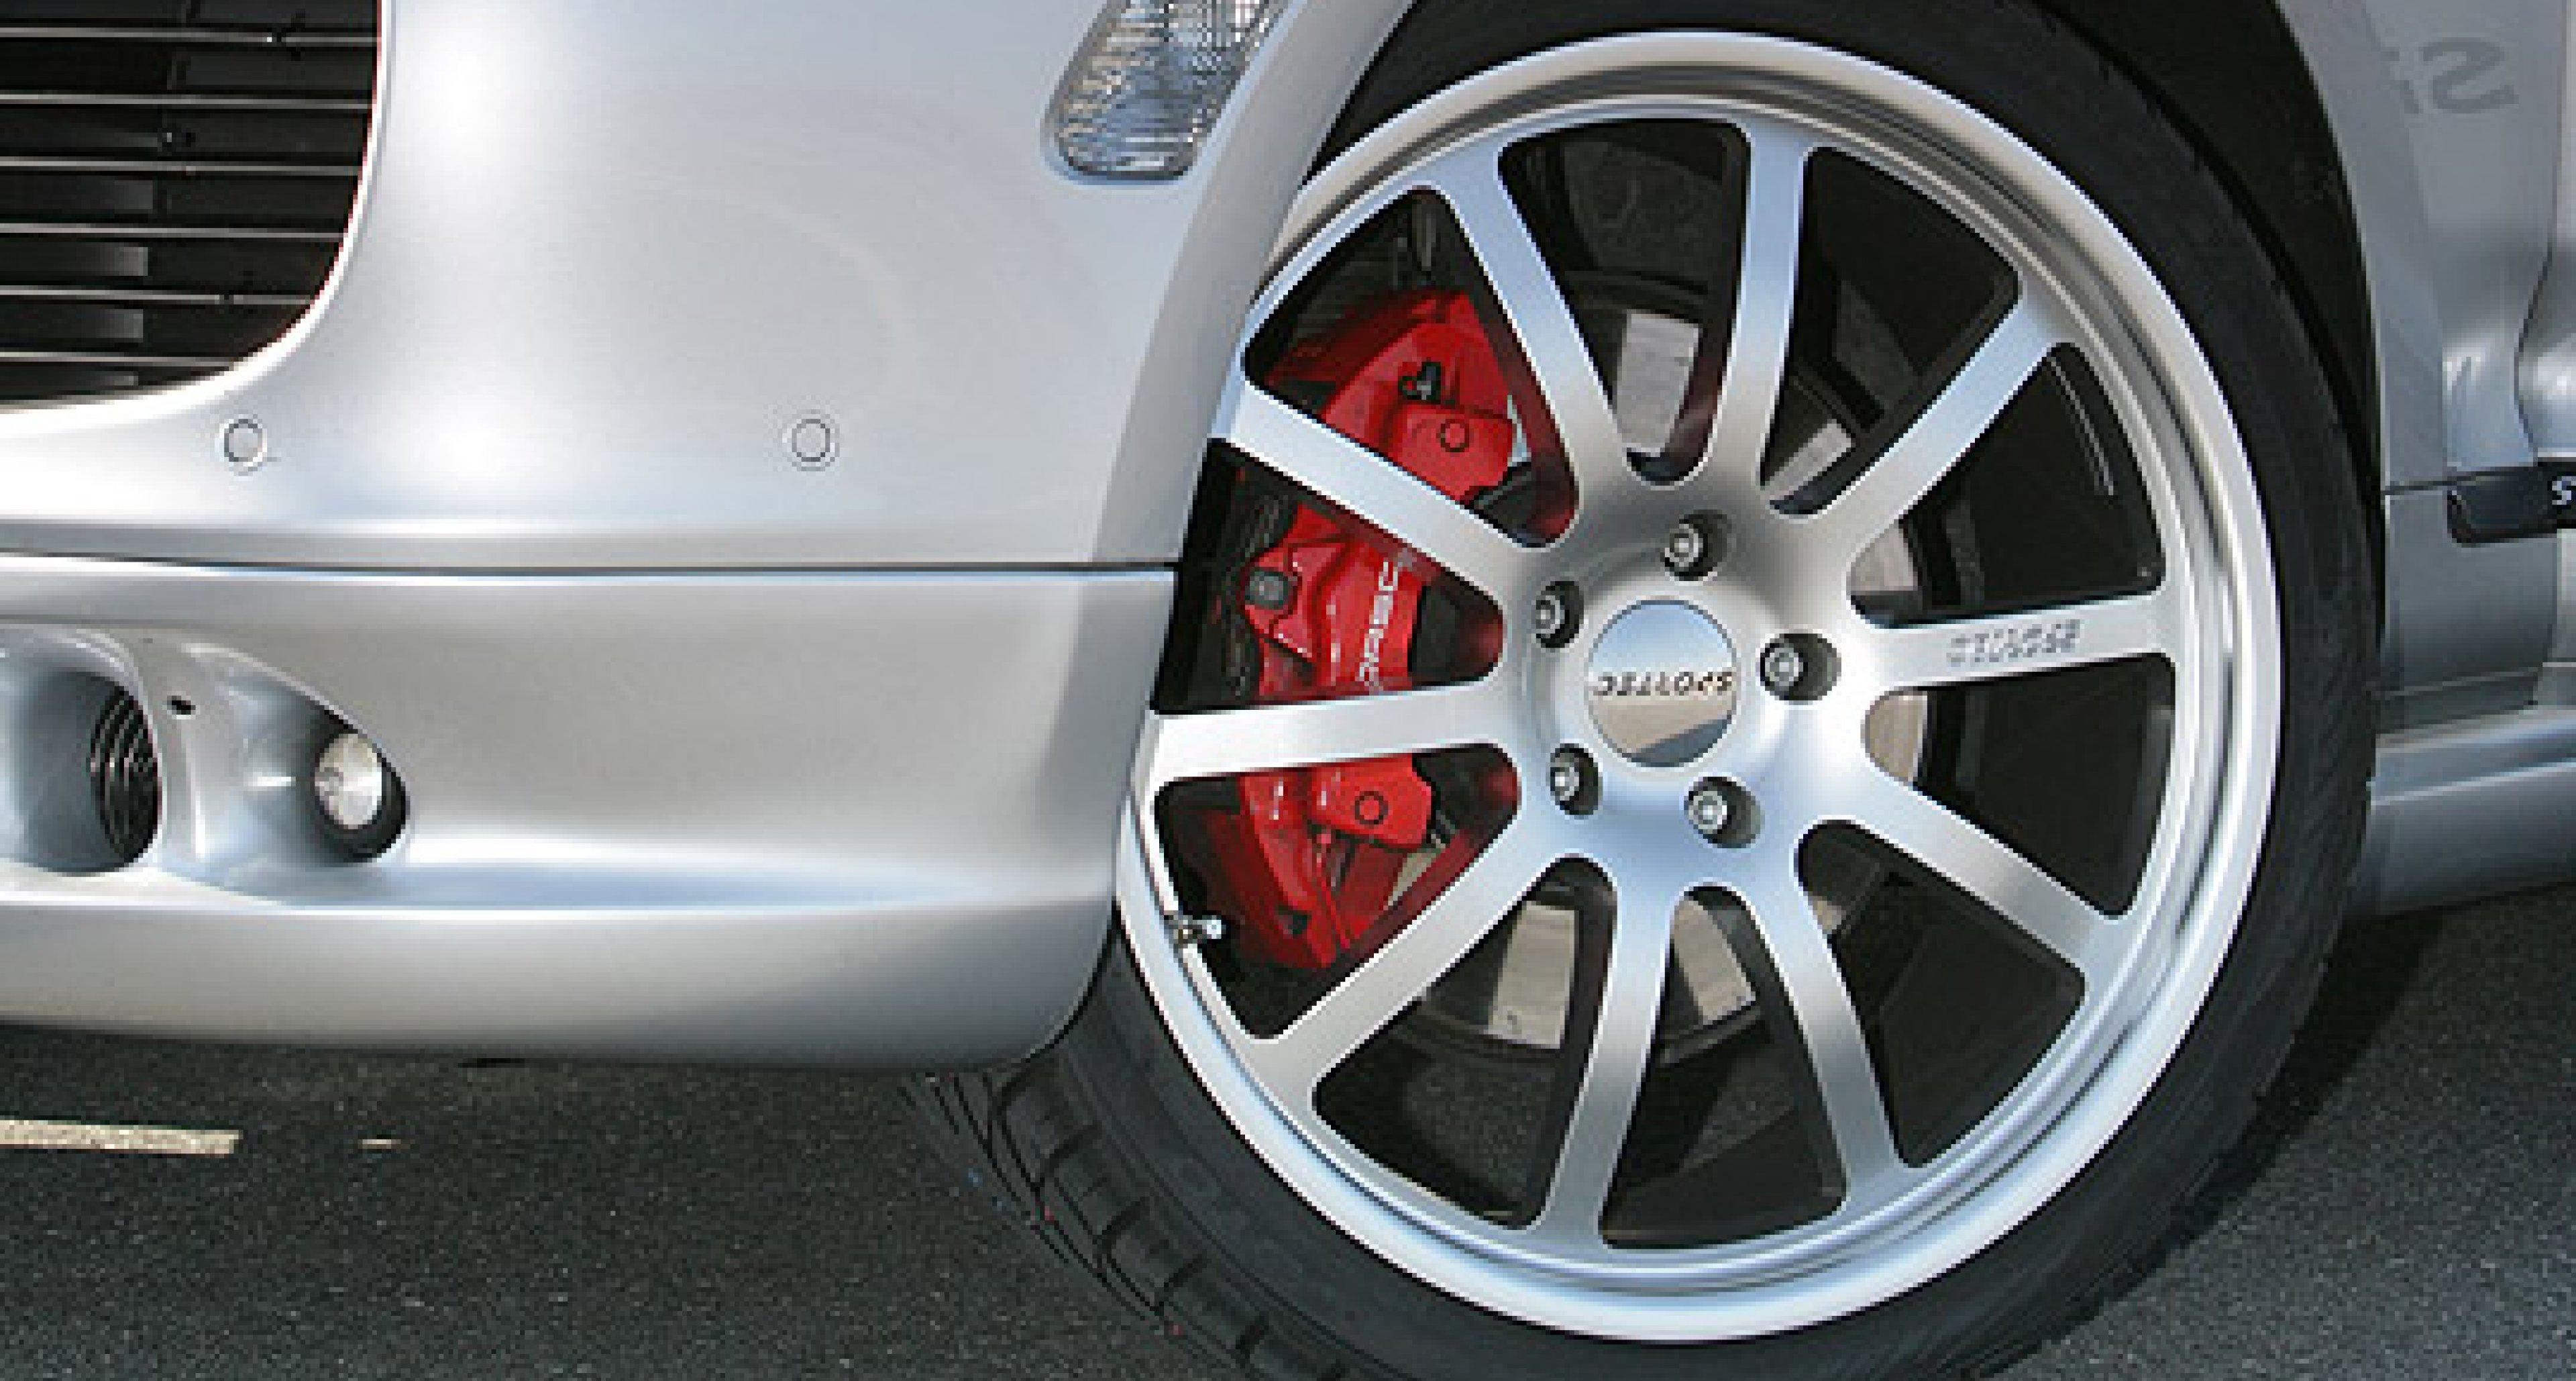 Toyo High-Performance-Reifen: Spurtreu